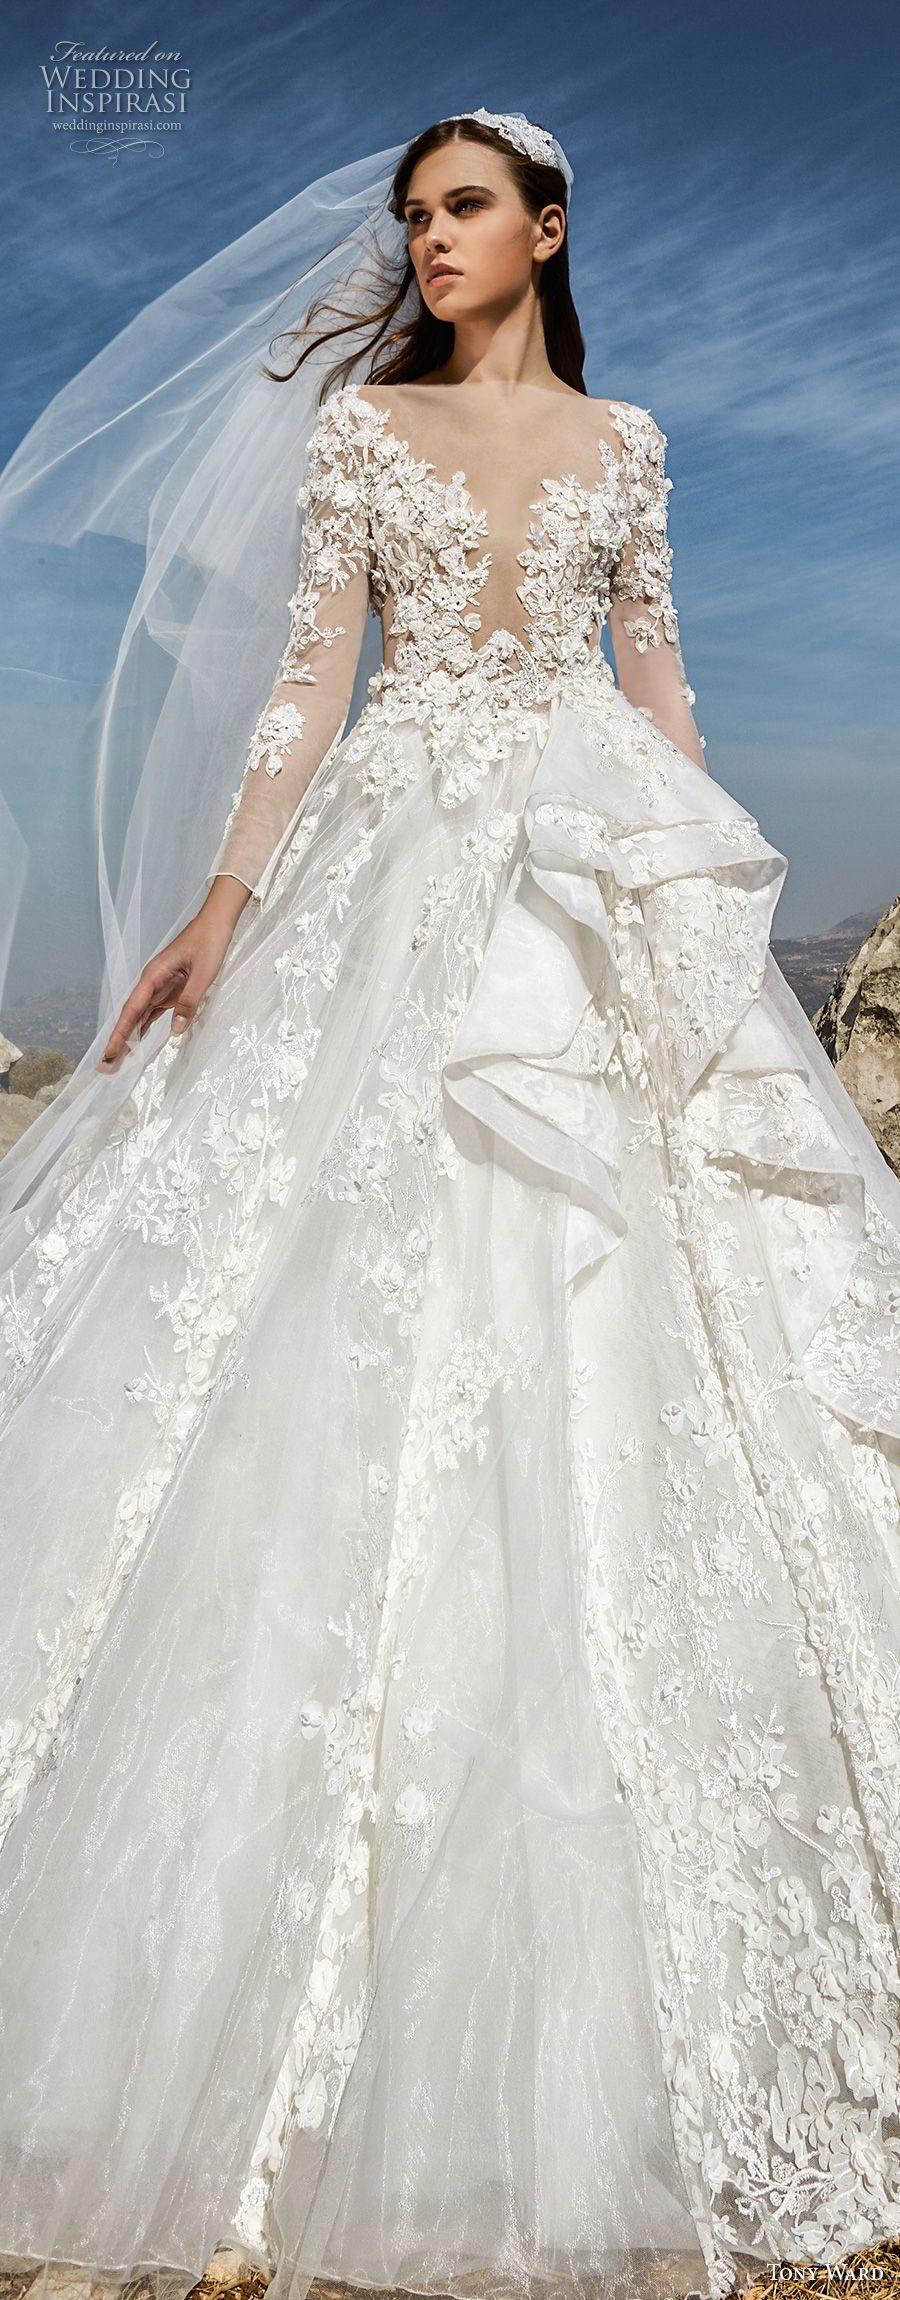 tony ward fall 2018 bridal long sleeves illusion bateau deep plunging sweetheart neckline heavily embellished bodice princess ball gown a line wedding dress (1) lv